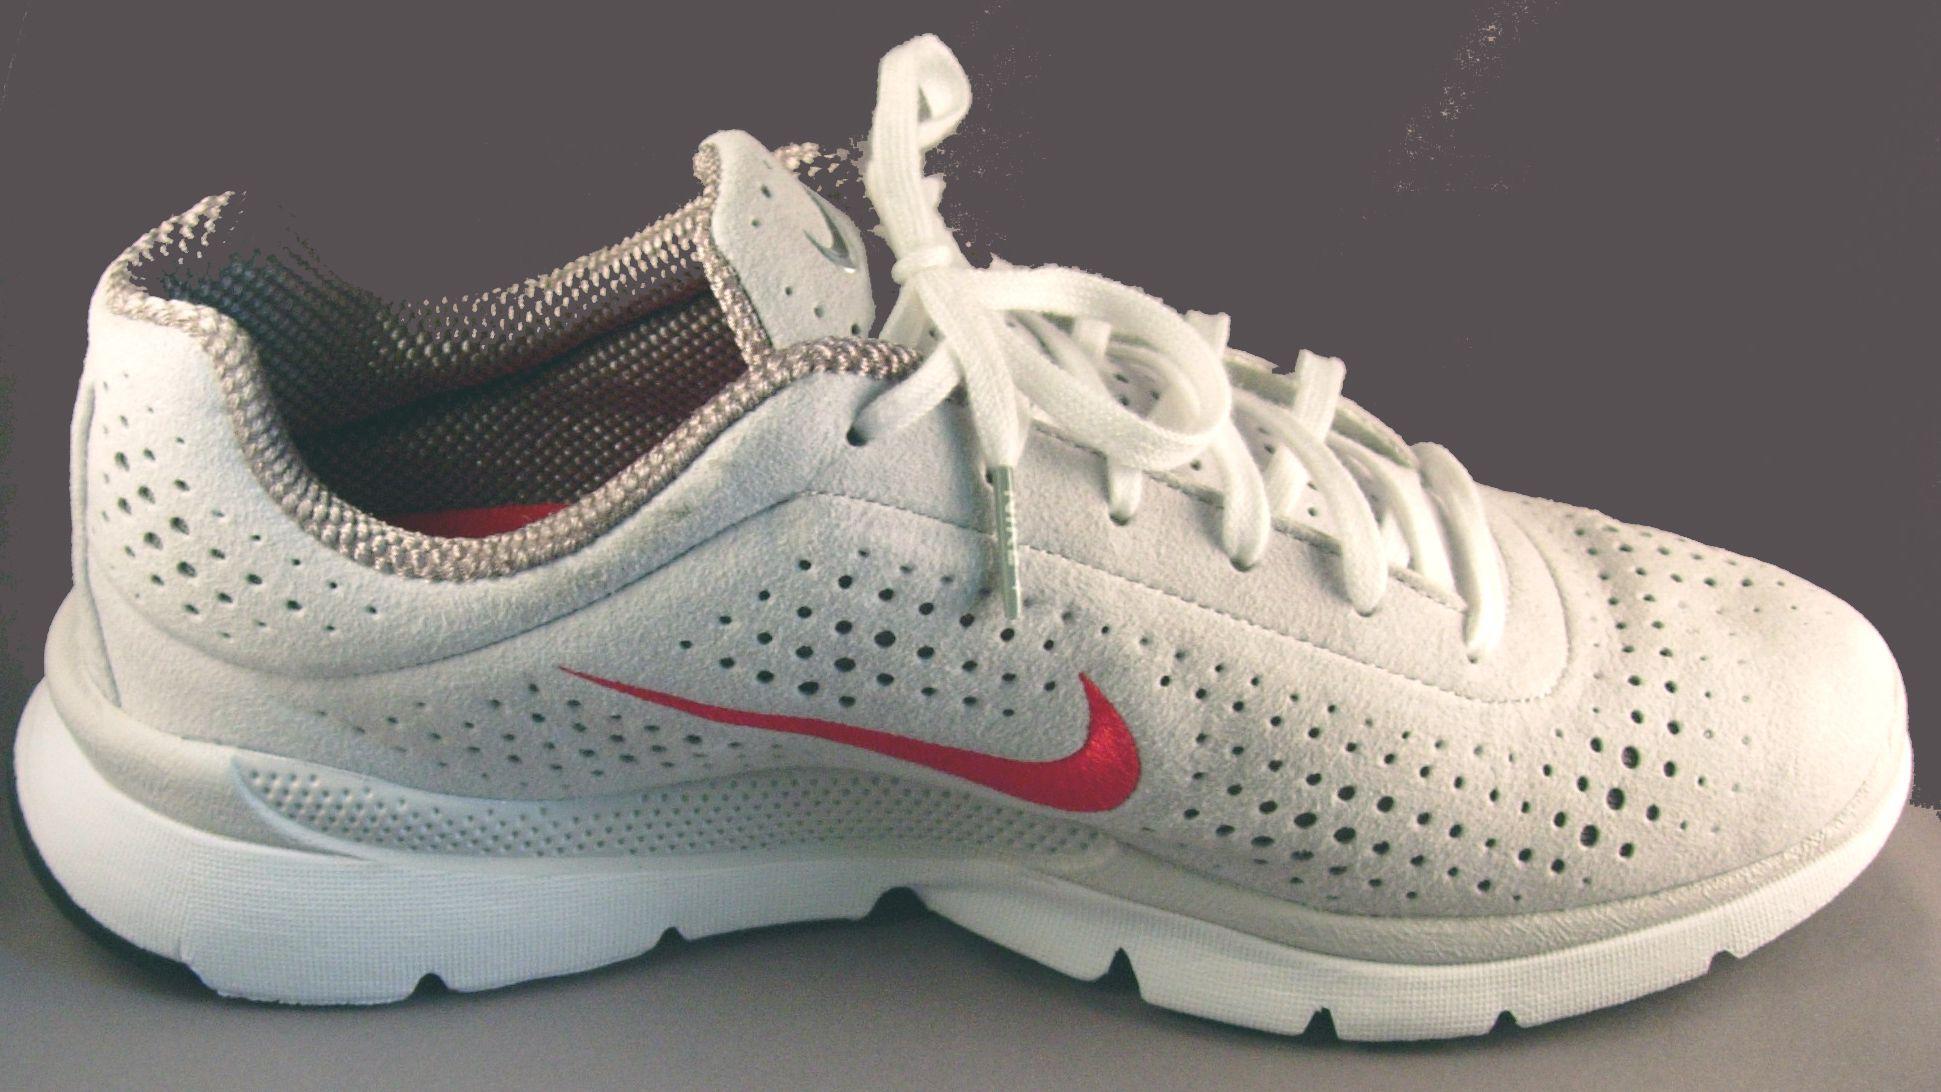 hospital Representar Una buena amiga  Pouches and Shoes for the Nike+ Sensor